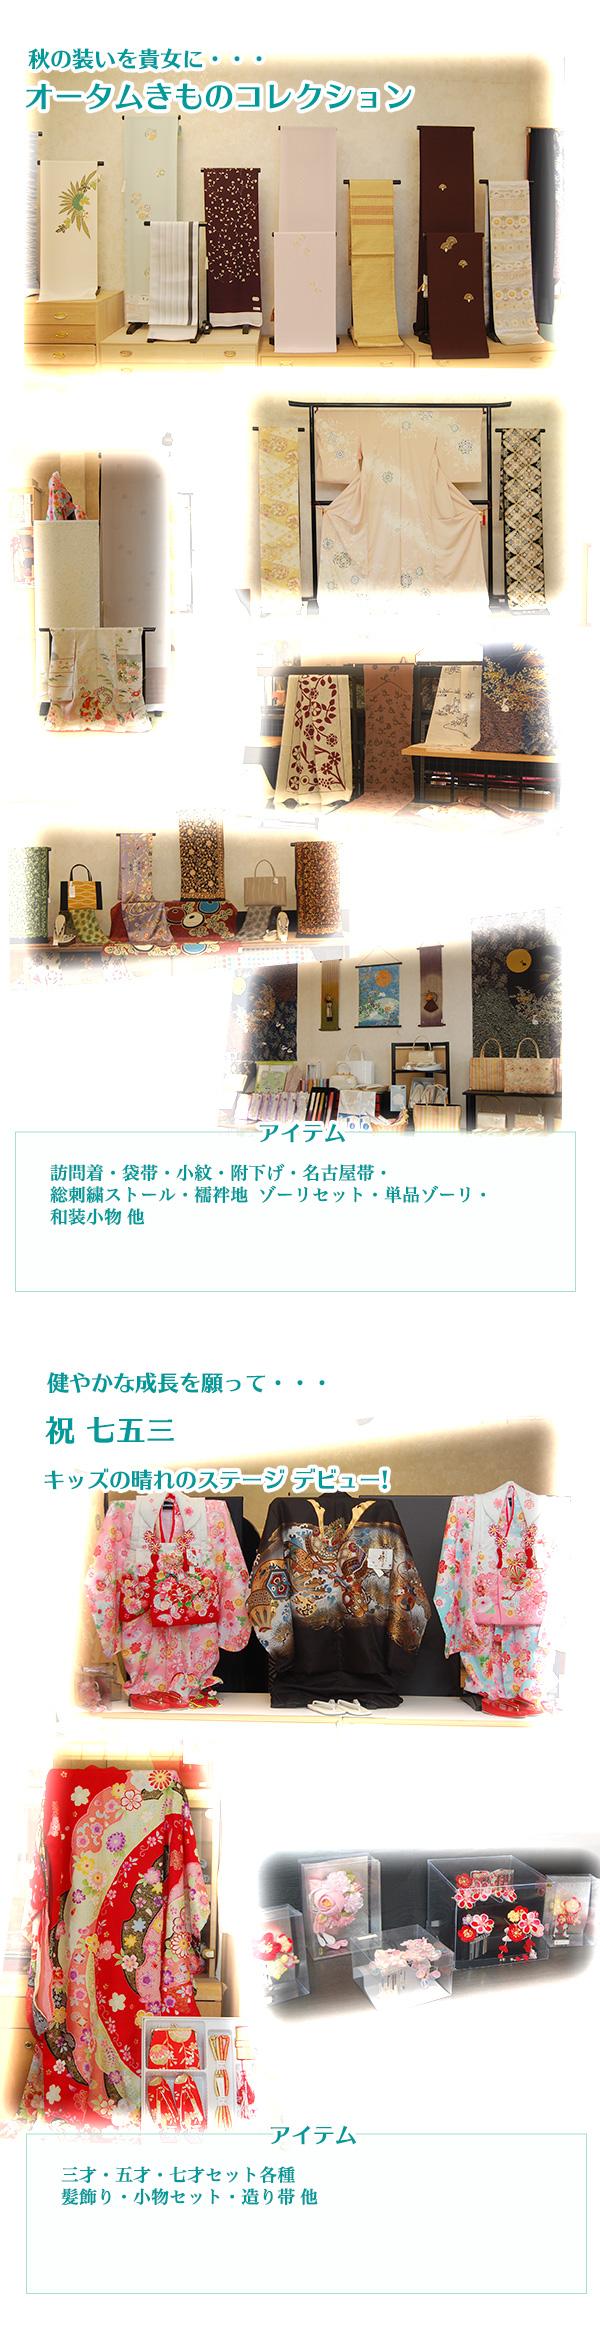 2021-09-13_go_fig01.jpg